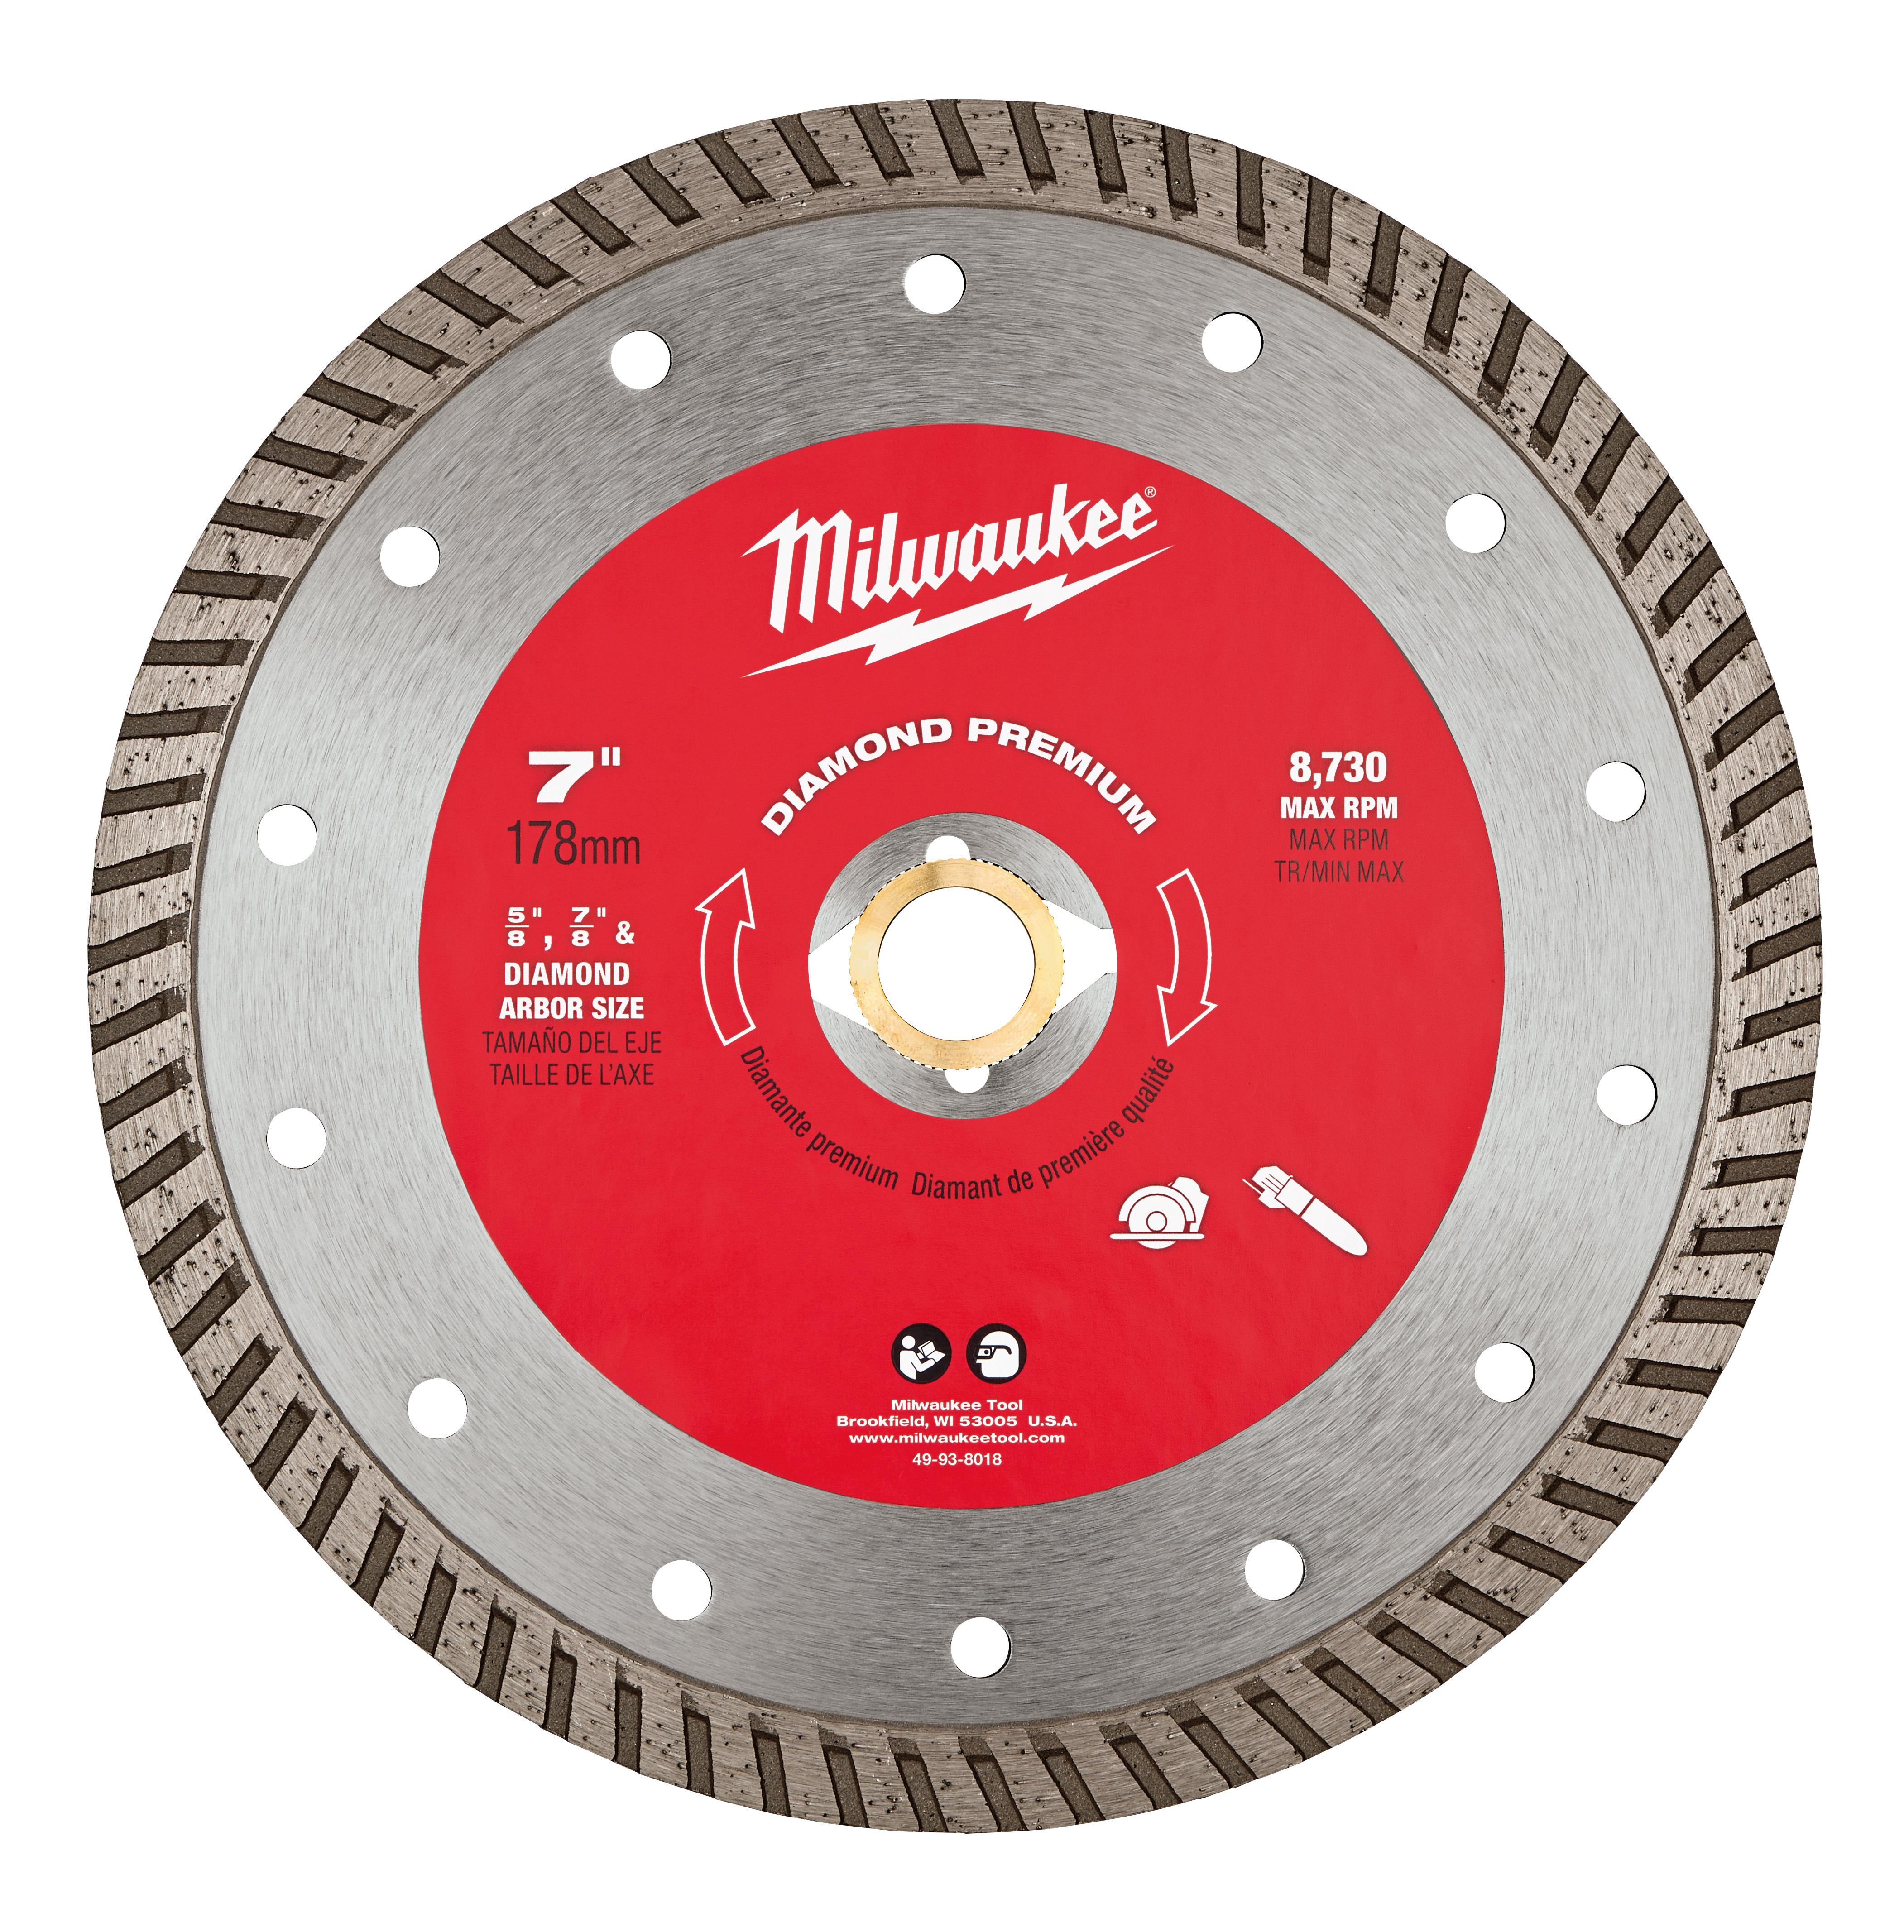 Milwaukee® 49-93-8018 Premium Turbo Circular Diamond Saw Blade, 7 in Dia Blade, 5/8 in, 7/8 in Arbor/Shank, Dry/Wet Cutting